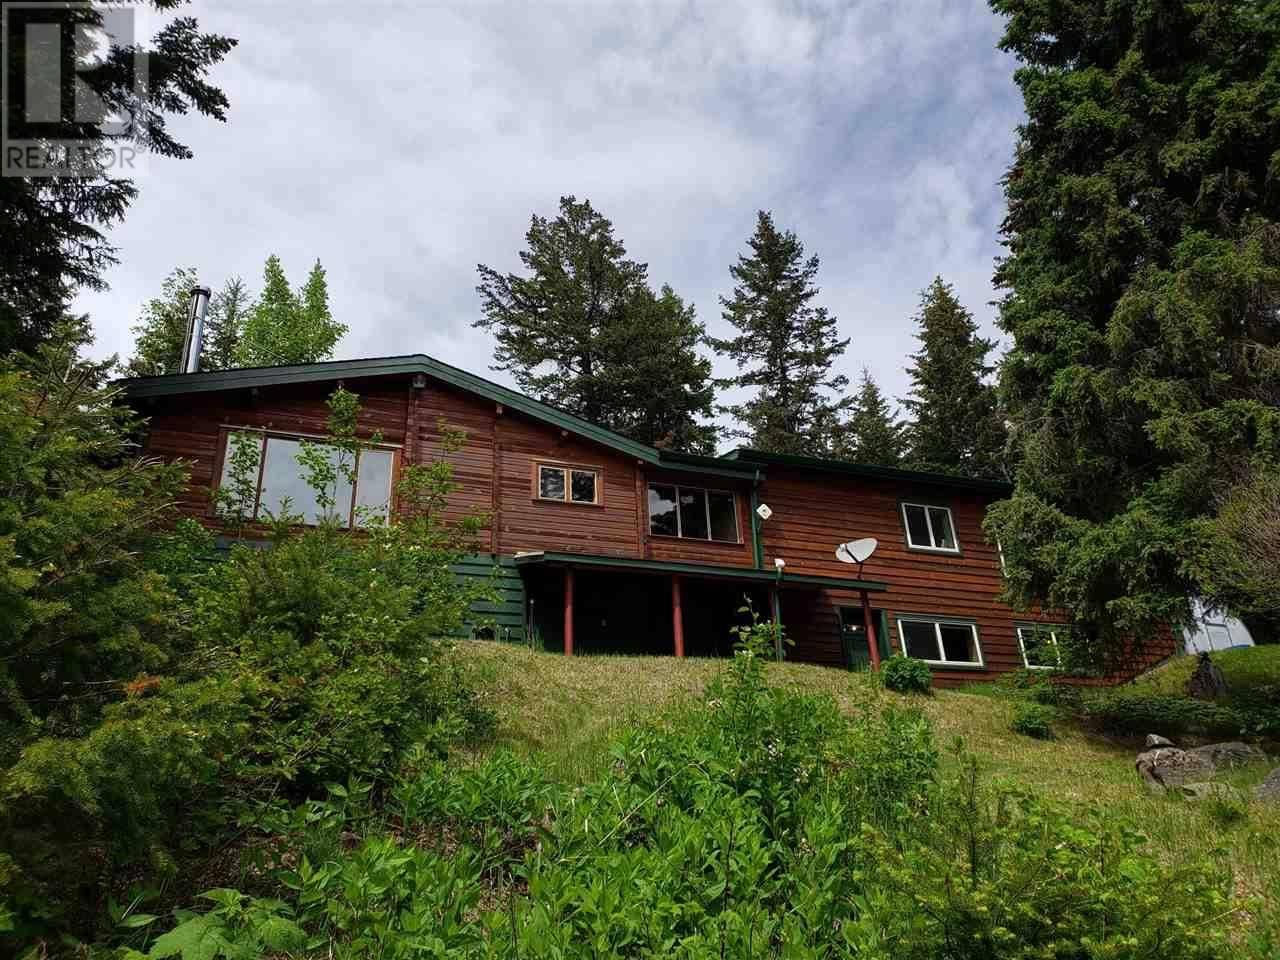 House for sale at 6059 Mahood Lake Rd Deka Lake / Sulphurous / Hathaway Lakes British Columbia - MLS: R2441733